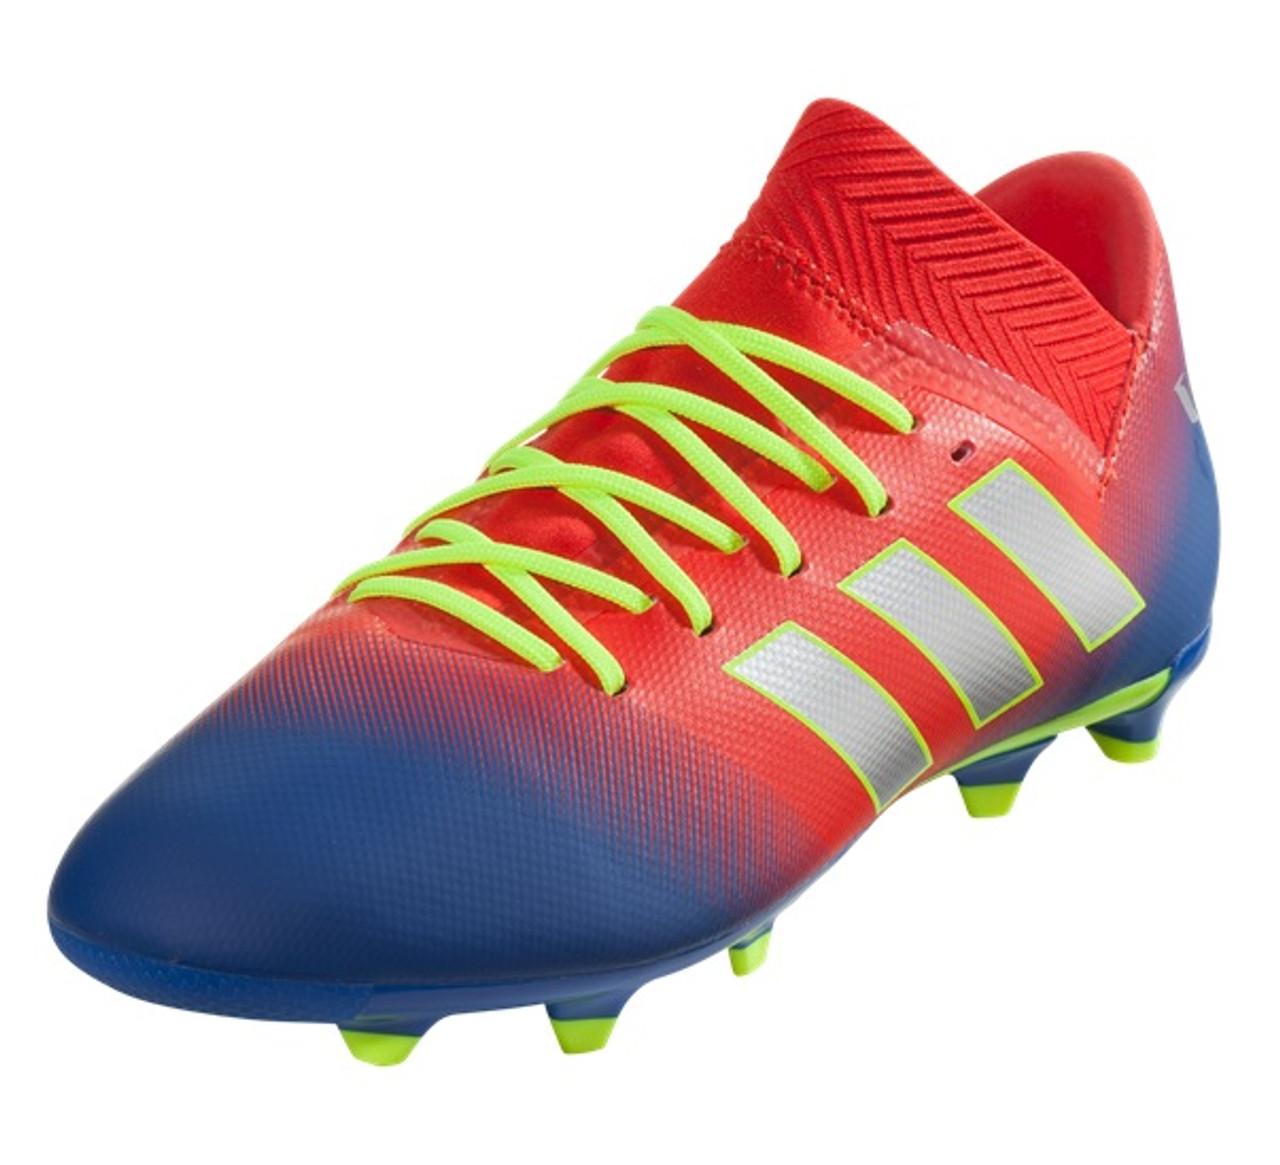 2b7fb5f30 Adidas Nemeziz Messi FG Jr - Active Red/Silver Metallic/Football Blue  (113018) - ohp soccer